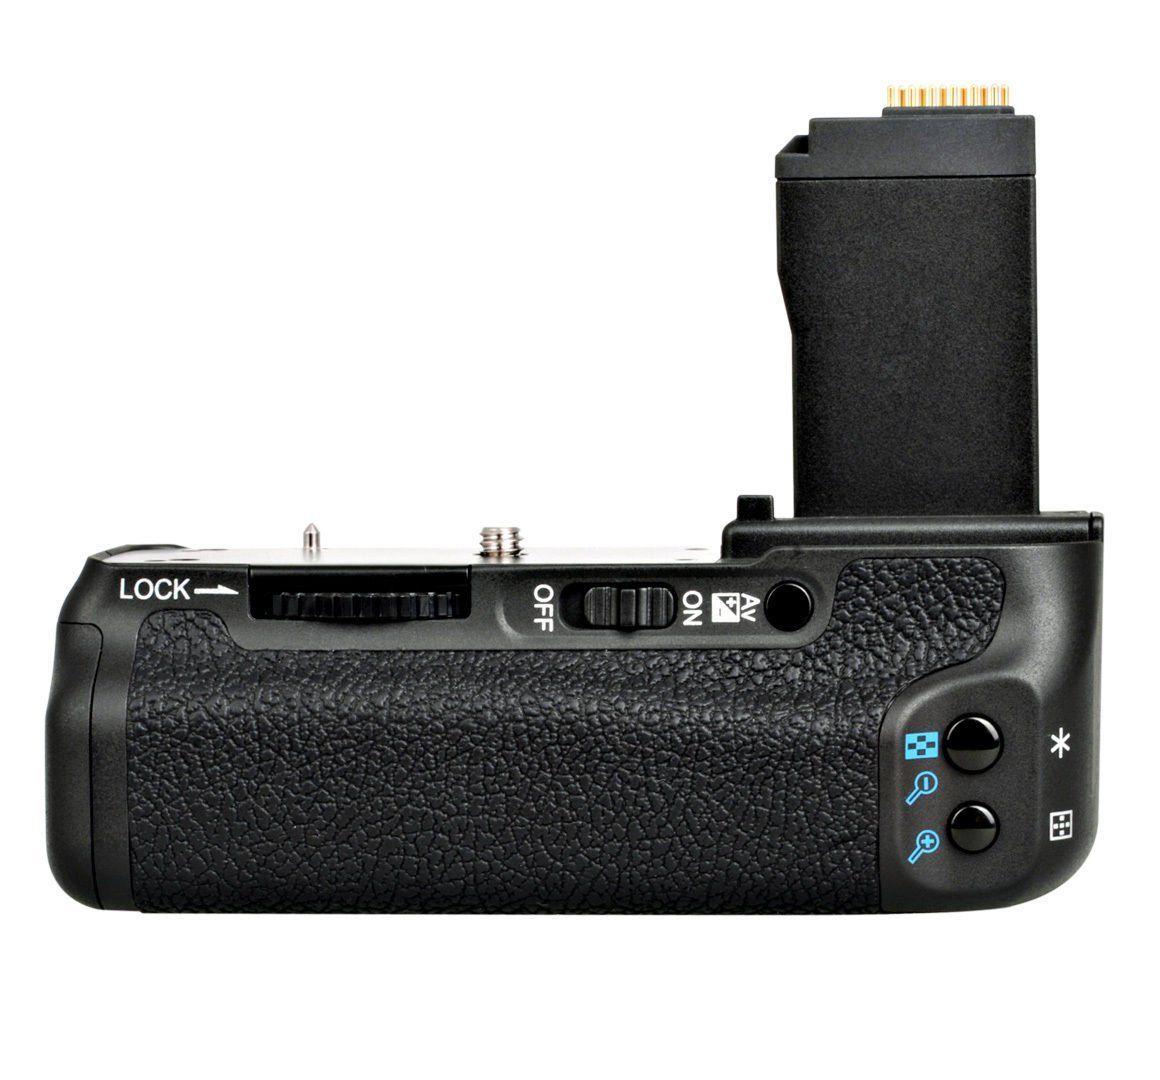 MEIKE MK-760D vertical Battery Grip Holder for Canon 750D 760D LP-E17 as BG-E18 pro vertical battery grip holder for canon eos 760d 750d t6s t6i ix8 as bg e18